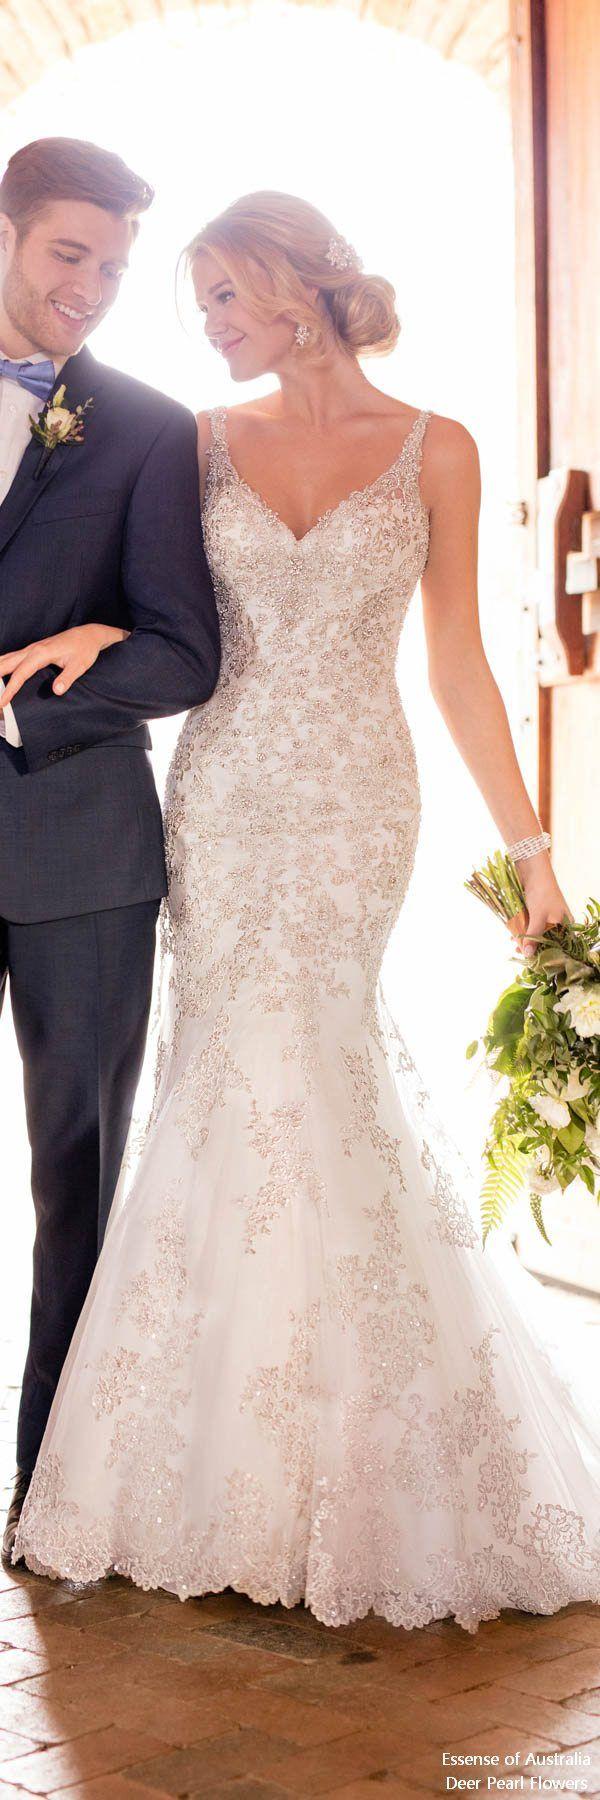 Essense of Australia Wedding Dresses